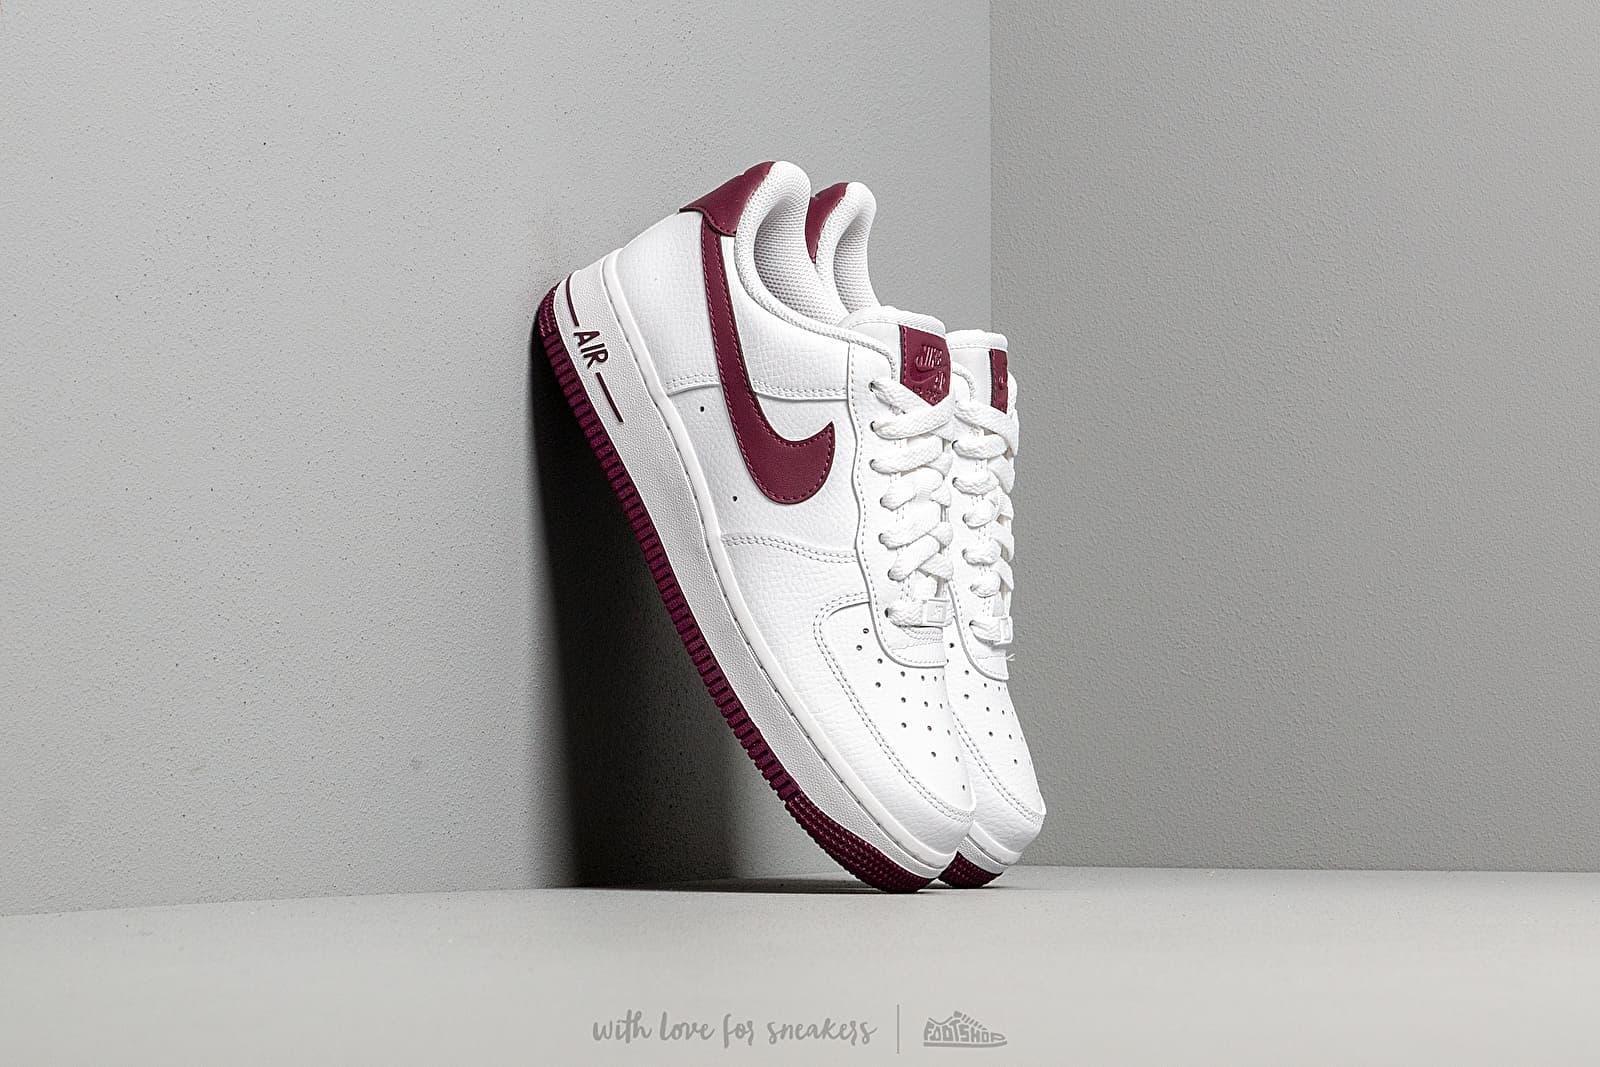 new style c64af 8eb60 Nike Wmns Air Force 1  07 White  Bordeaux a prezzo eccezionale 97 €  acquistate